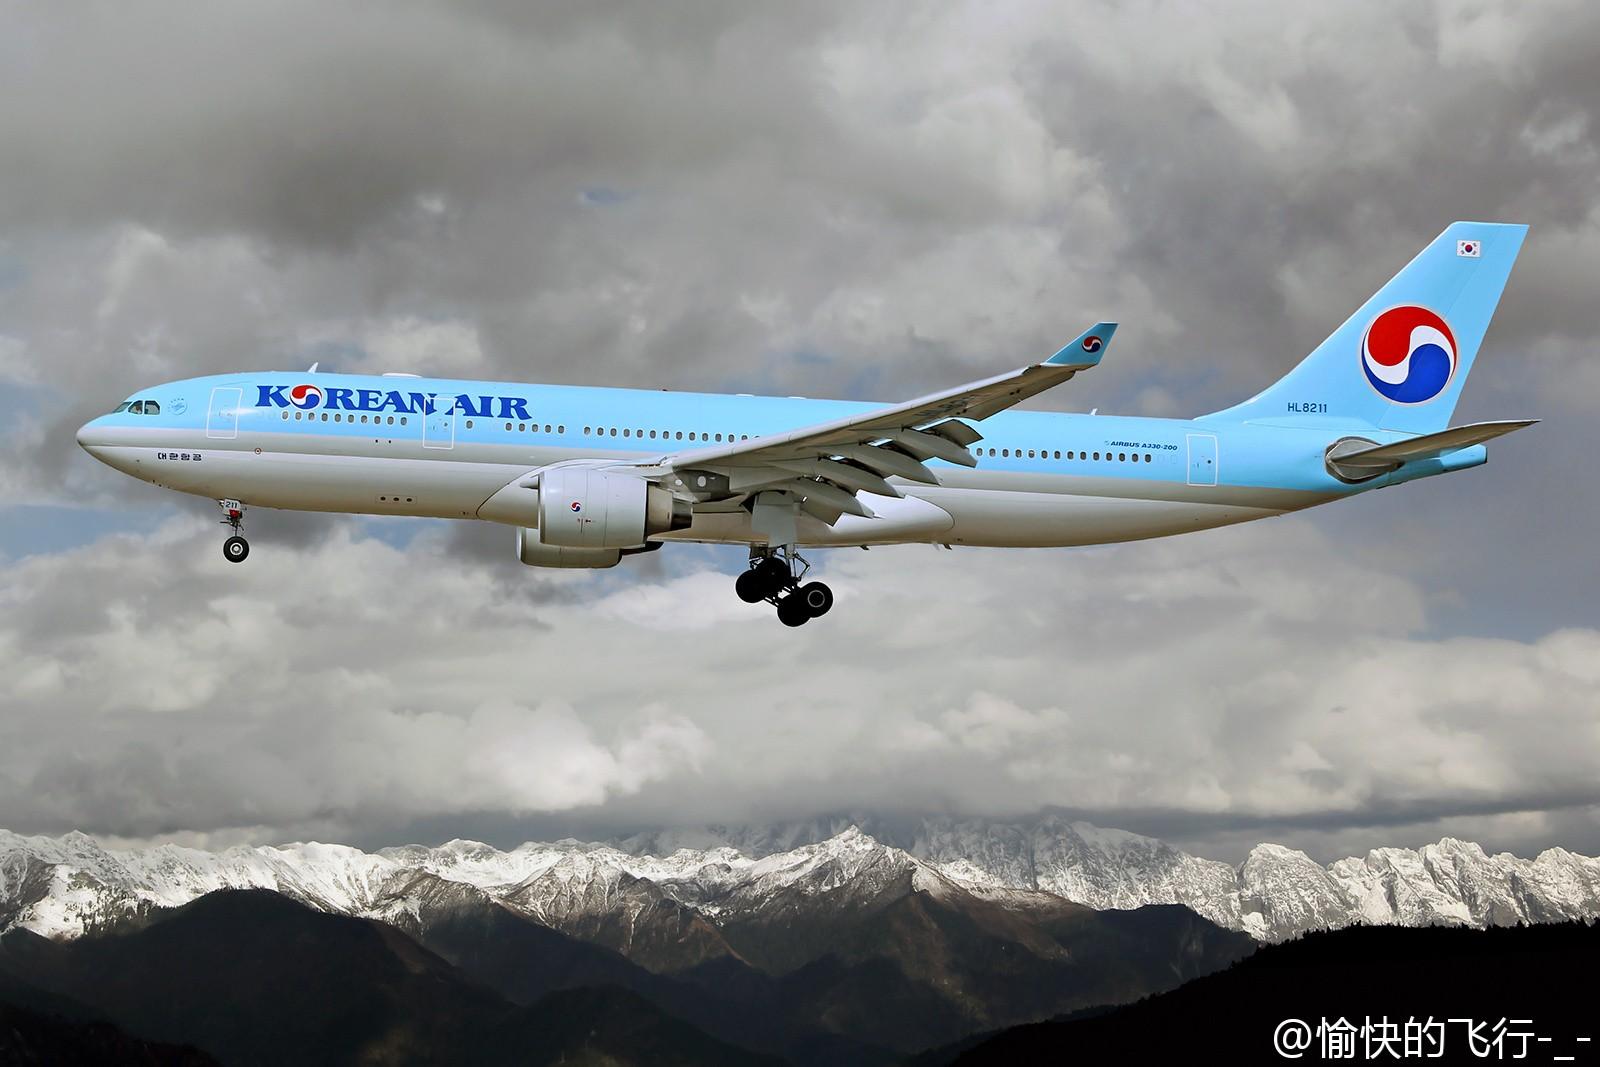 Re:[原创]。。。飞机美不美主要看背景。。。 AIRBUS A330-200 HL8211